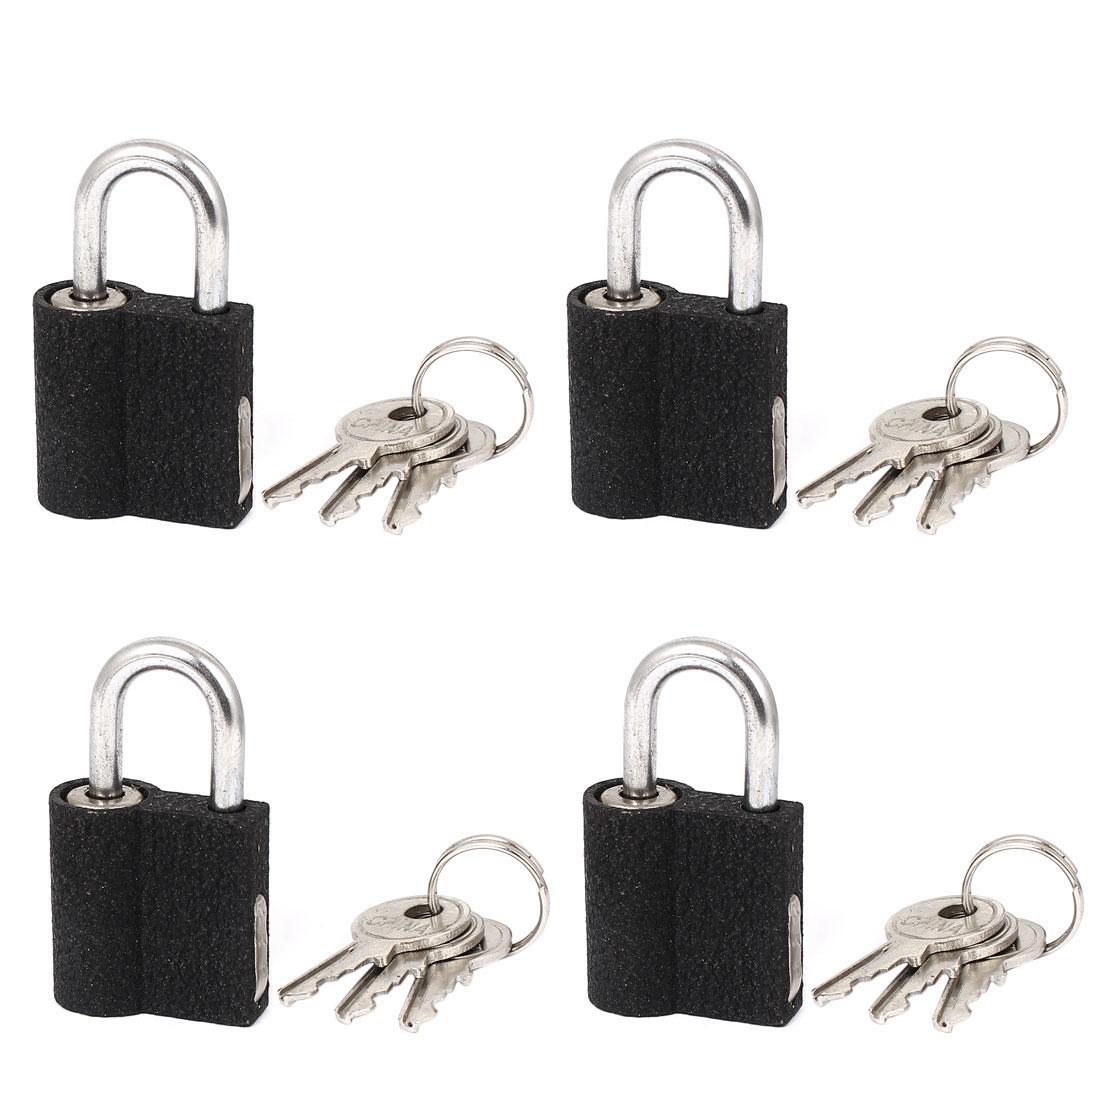 4pcs Metal Security Lock Drawer Gate Door Padlock with key 4.2cm x 2.5cm